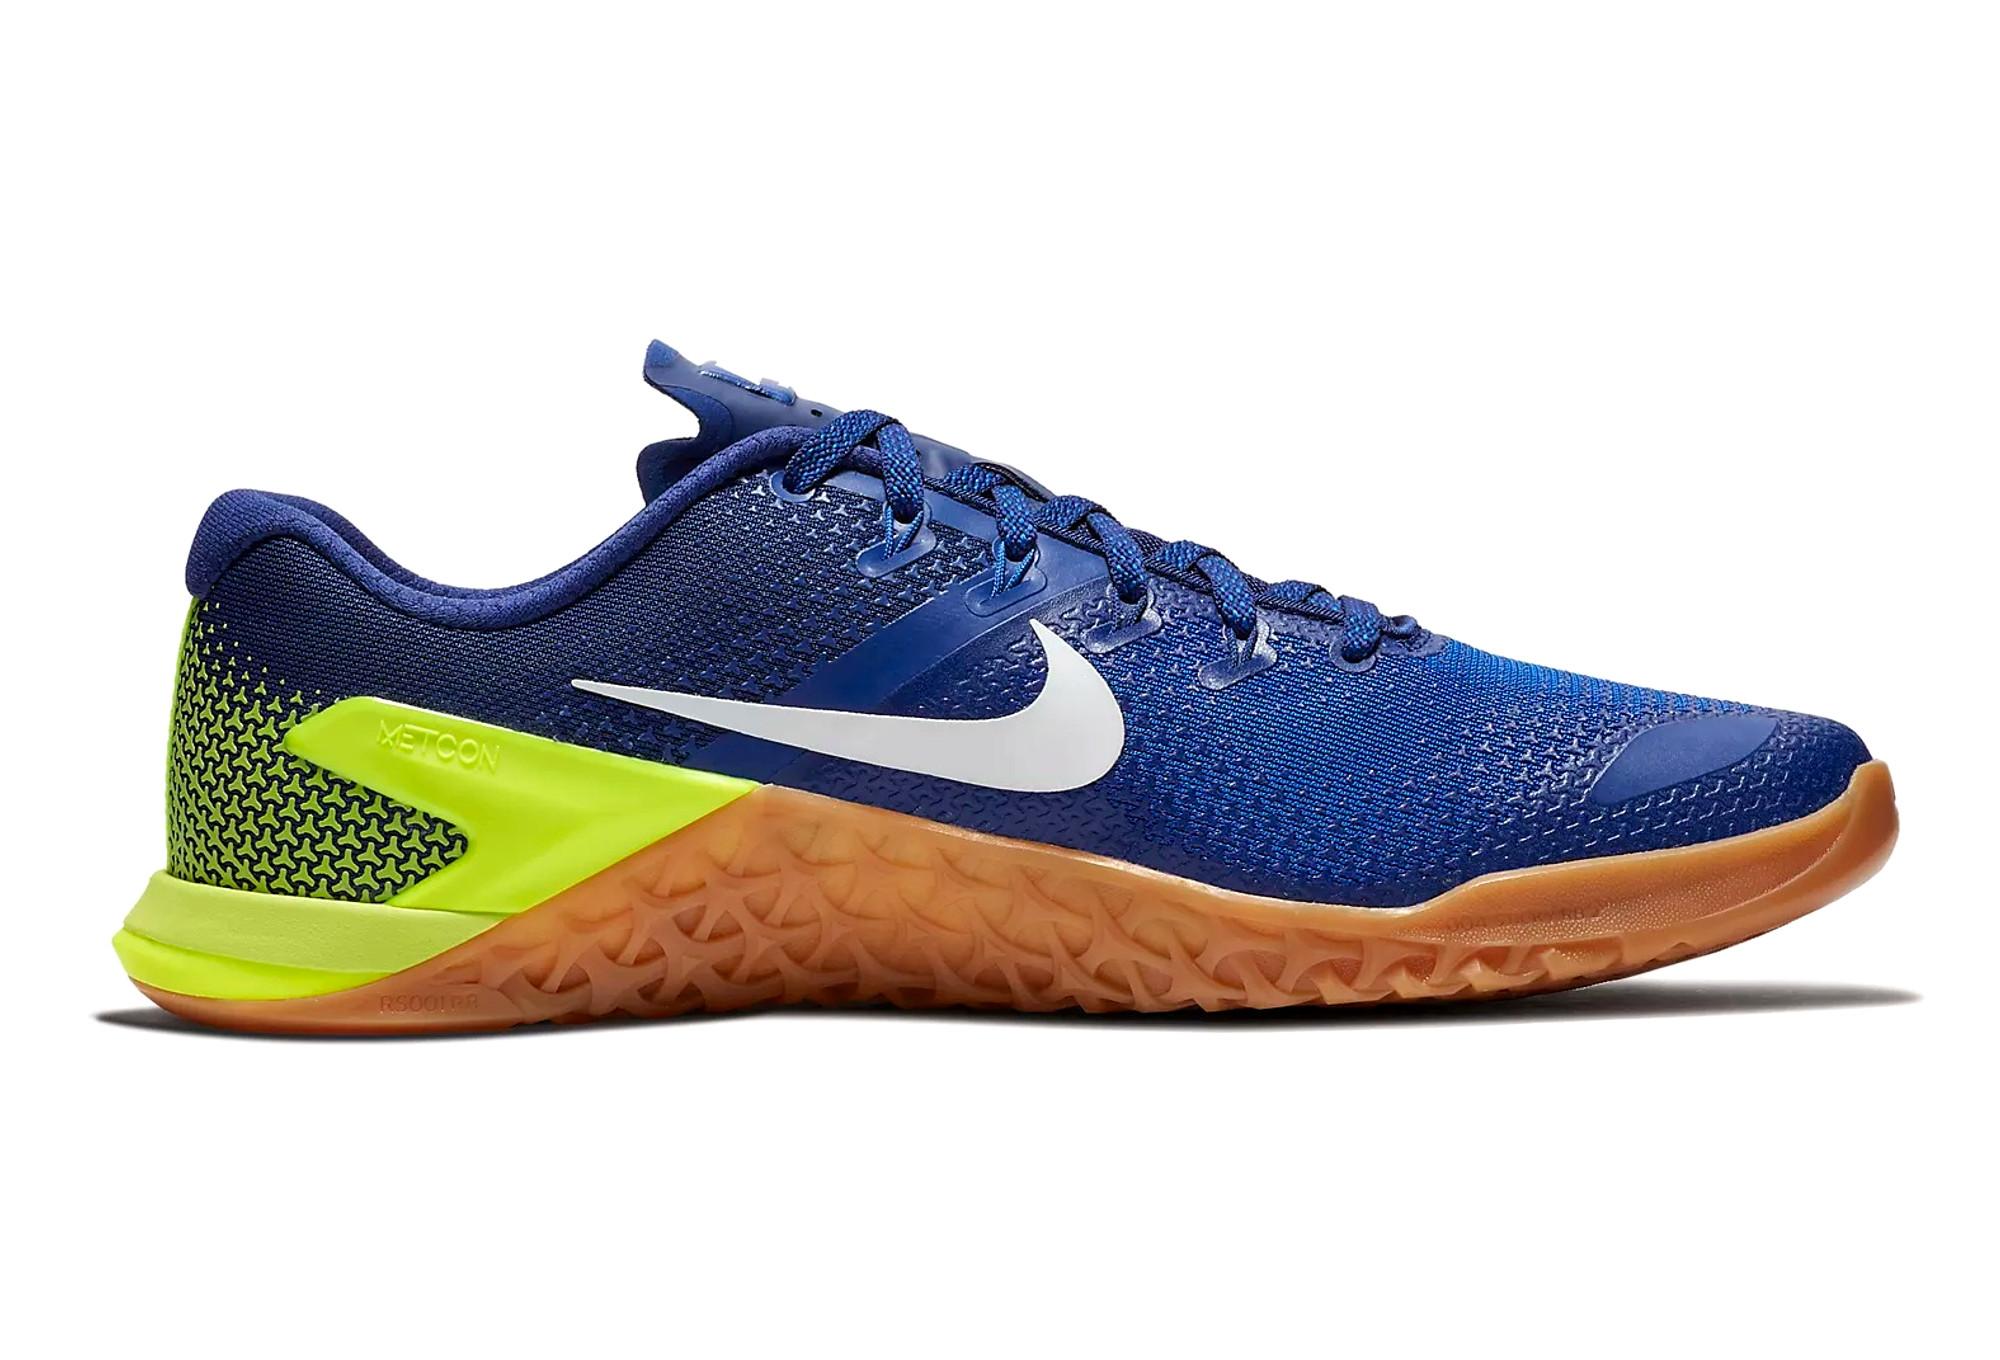 Nike Jaune 4 Chaussures Homme Metcon Bleu De Cross Training txwpPq